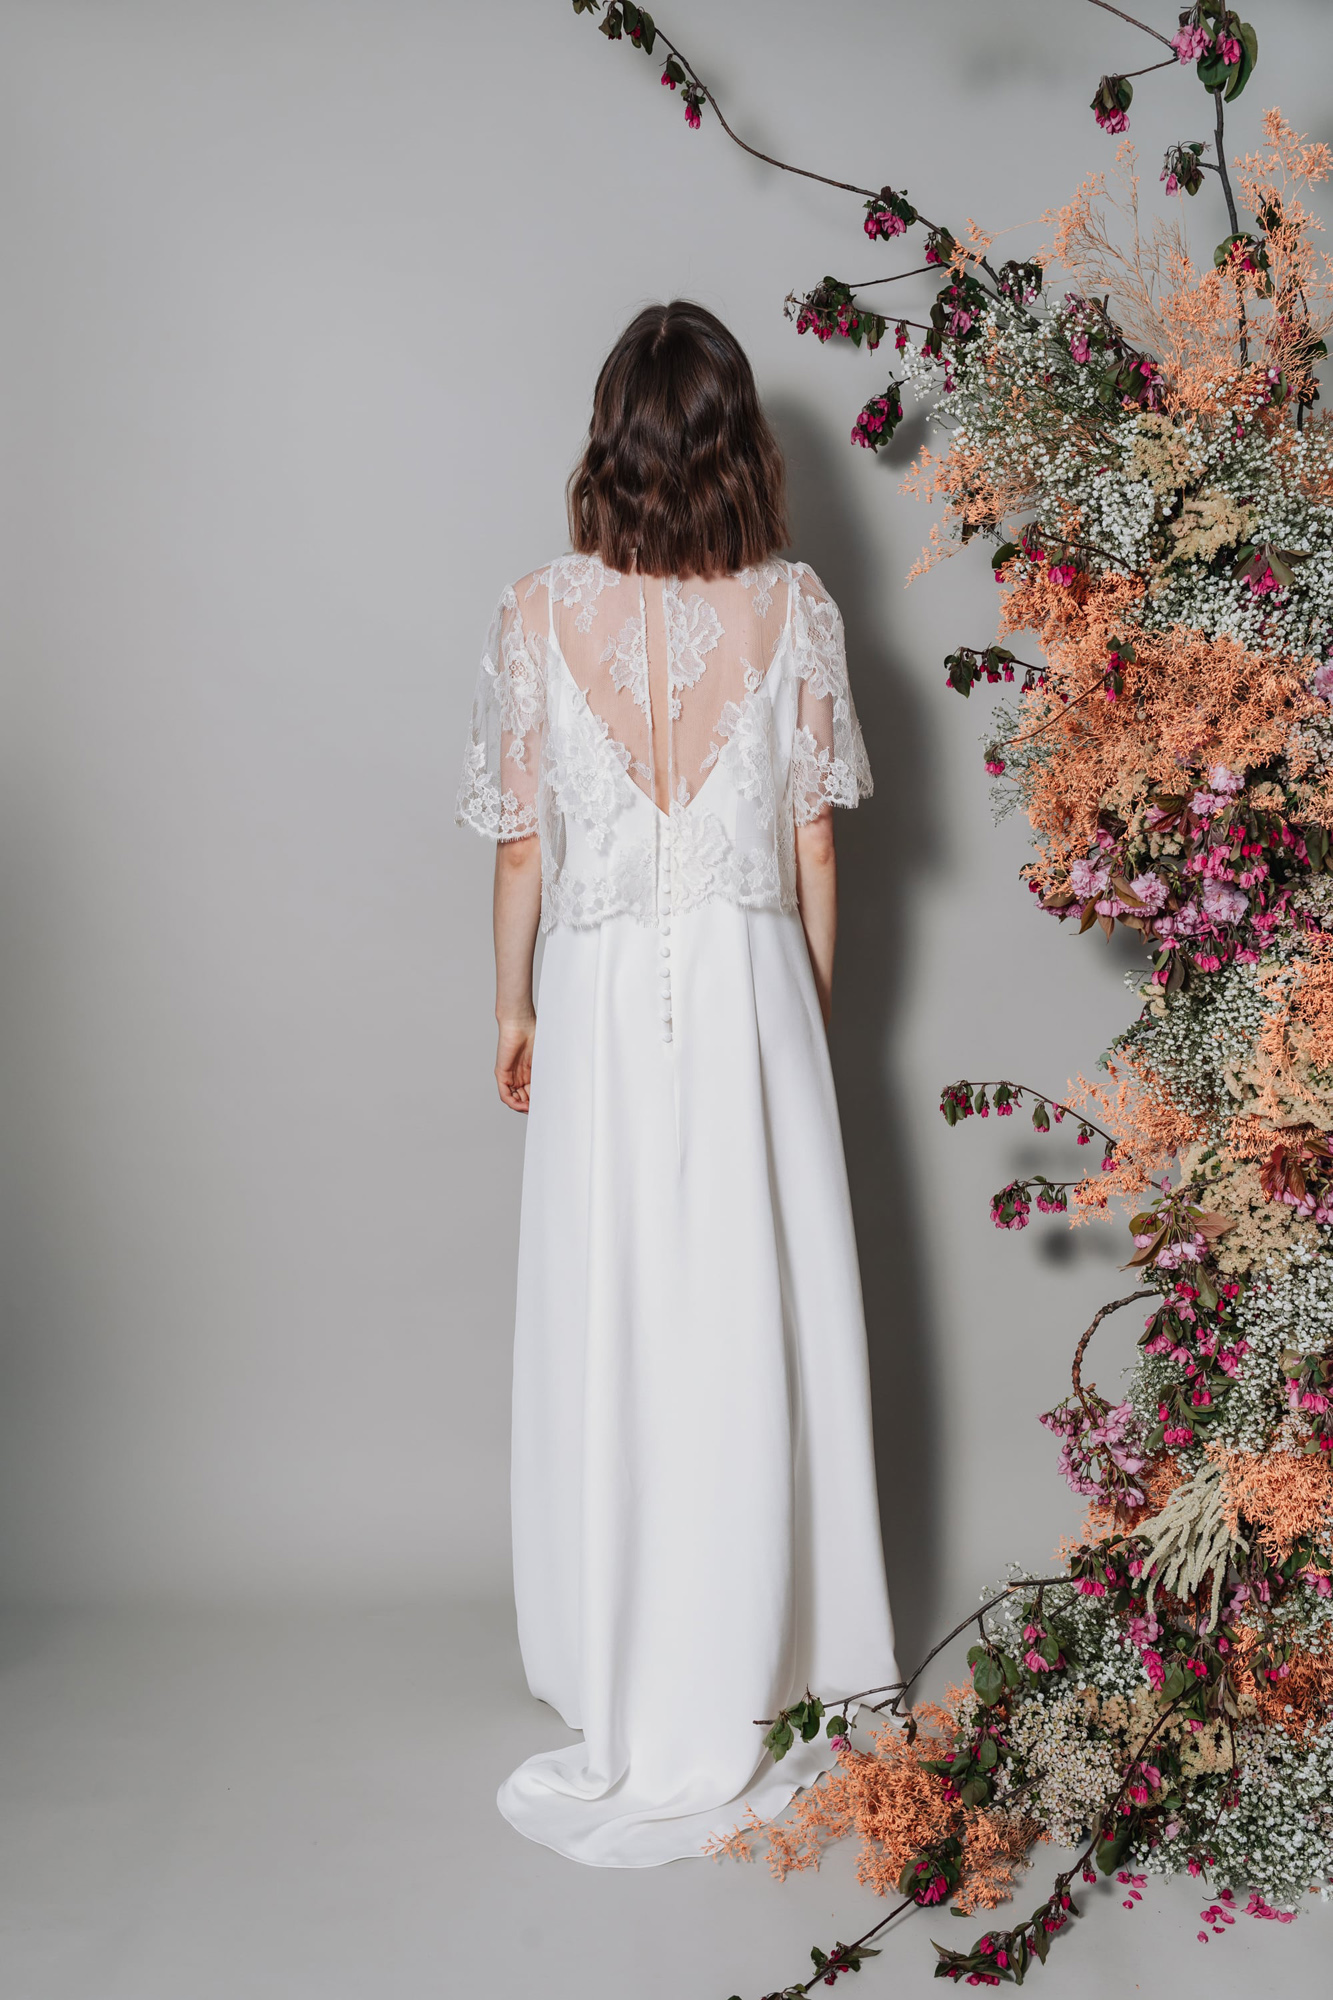 Kate-Beaumont-Sheffield-Rosa-Floral-Lace-Jacket-Snowdrop-Ivory-Matt-Silk-Modern-Wedding-Gown-3.jpg